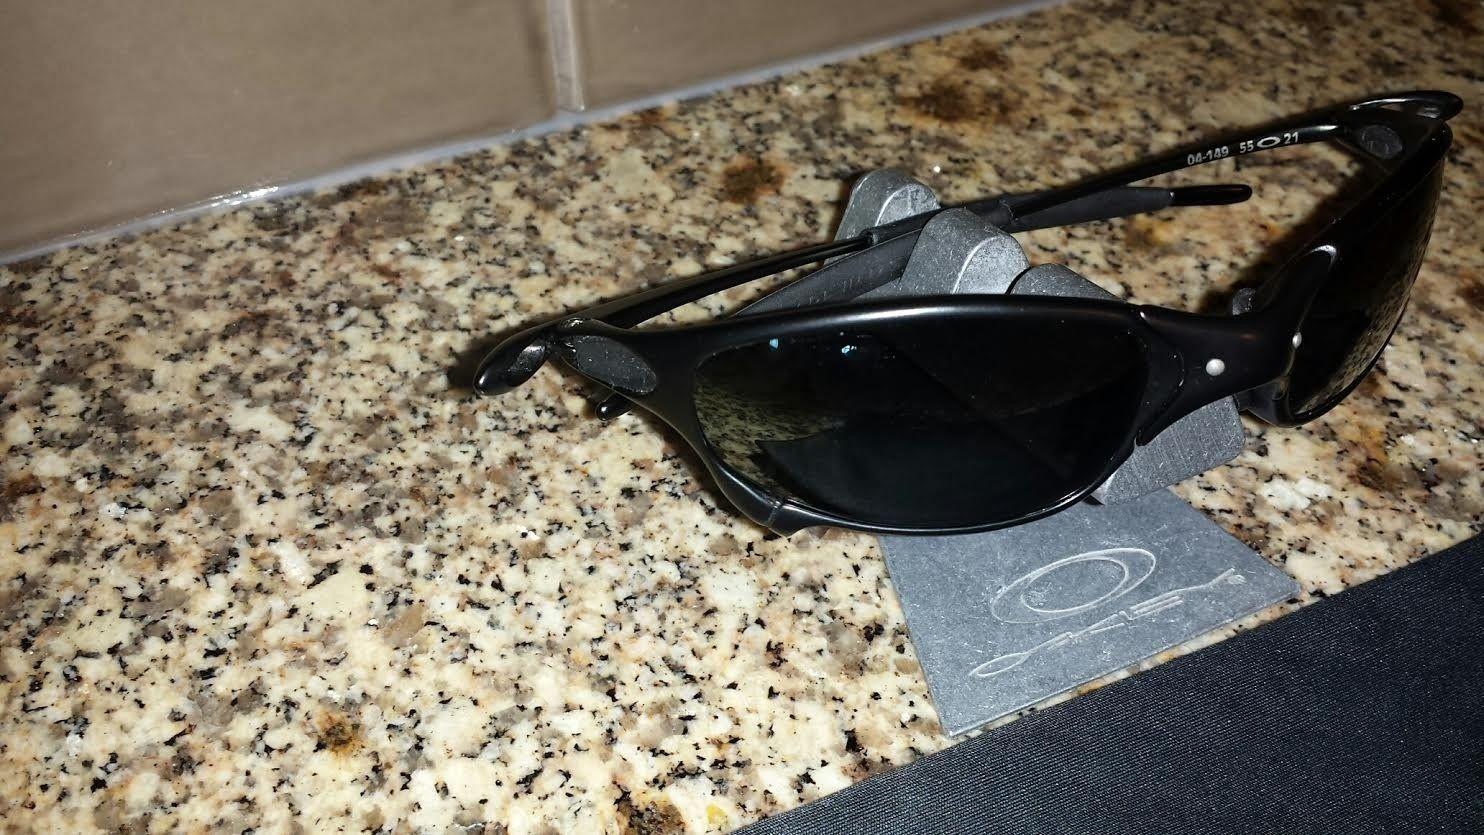 Carbon Juliet 04-149 Polarized Black Iridium - price drop $275 shipped - carbonjul2.jpe